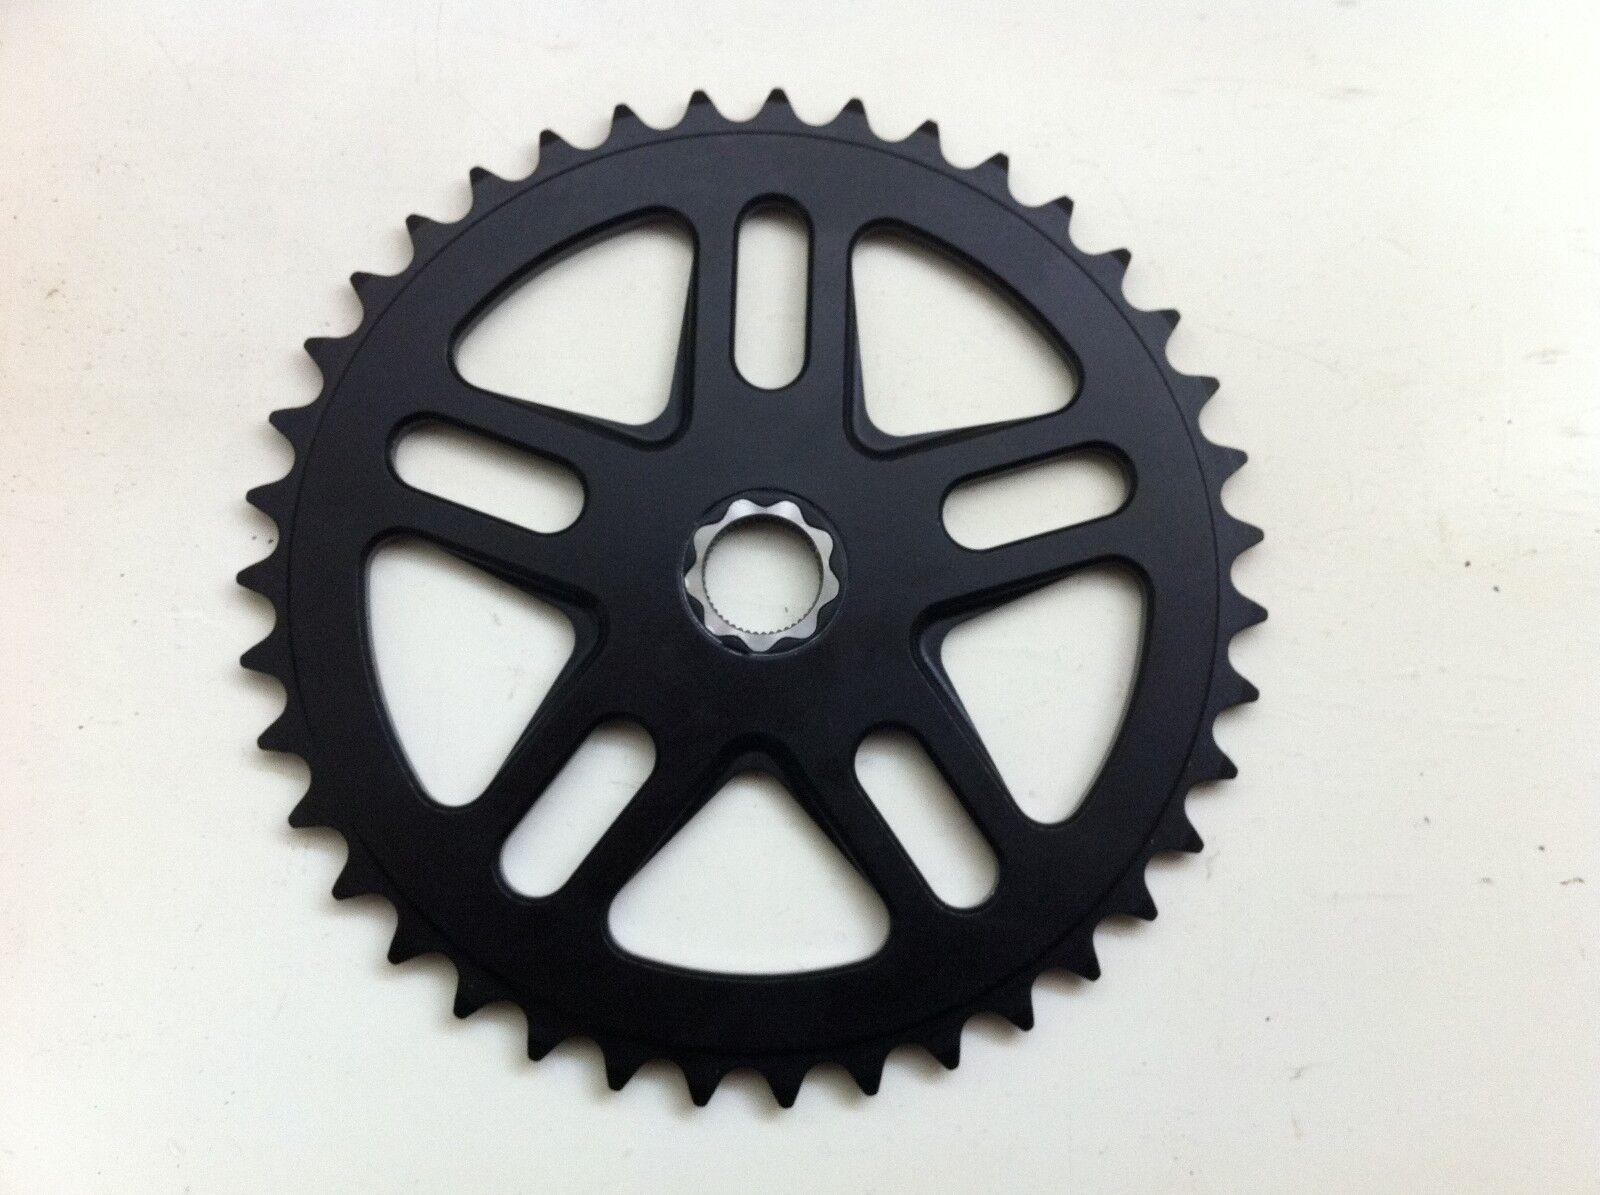 tuttioy SPLINE DRIVE Chainring Sprocket 48T19MM BMX 18 x 36T biciclettas ciclismo nuovo